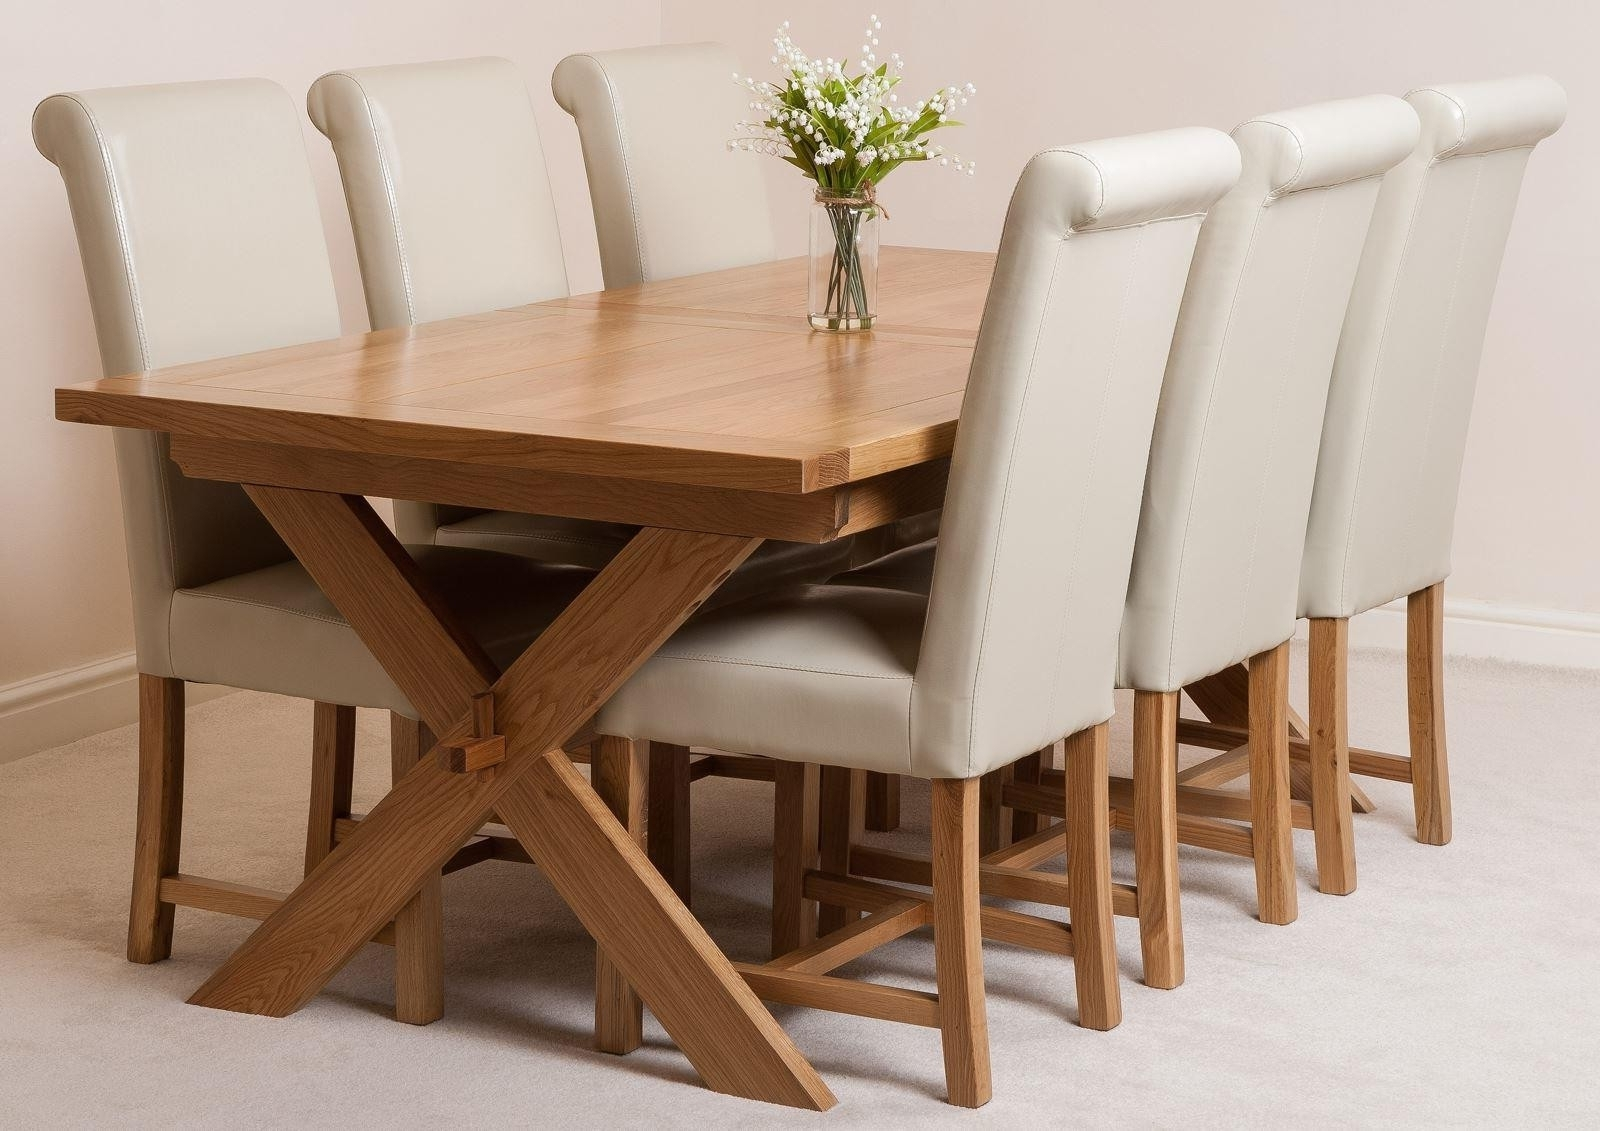 Oak Furniture King (View 18 of 25)